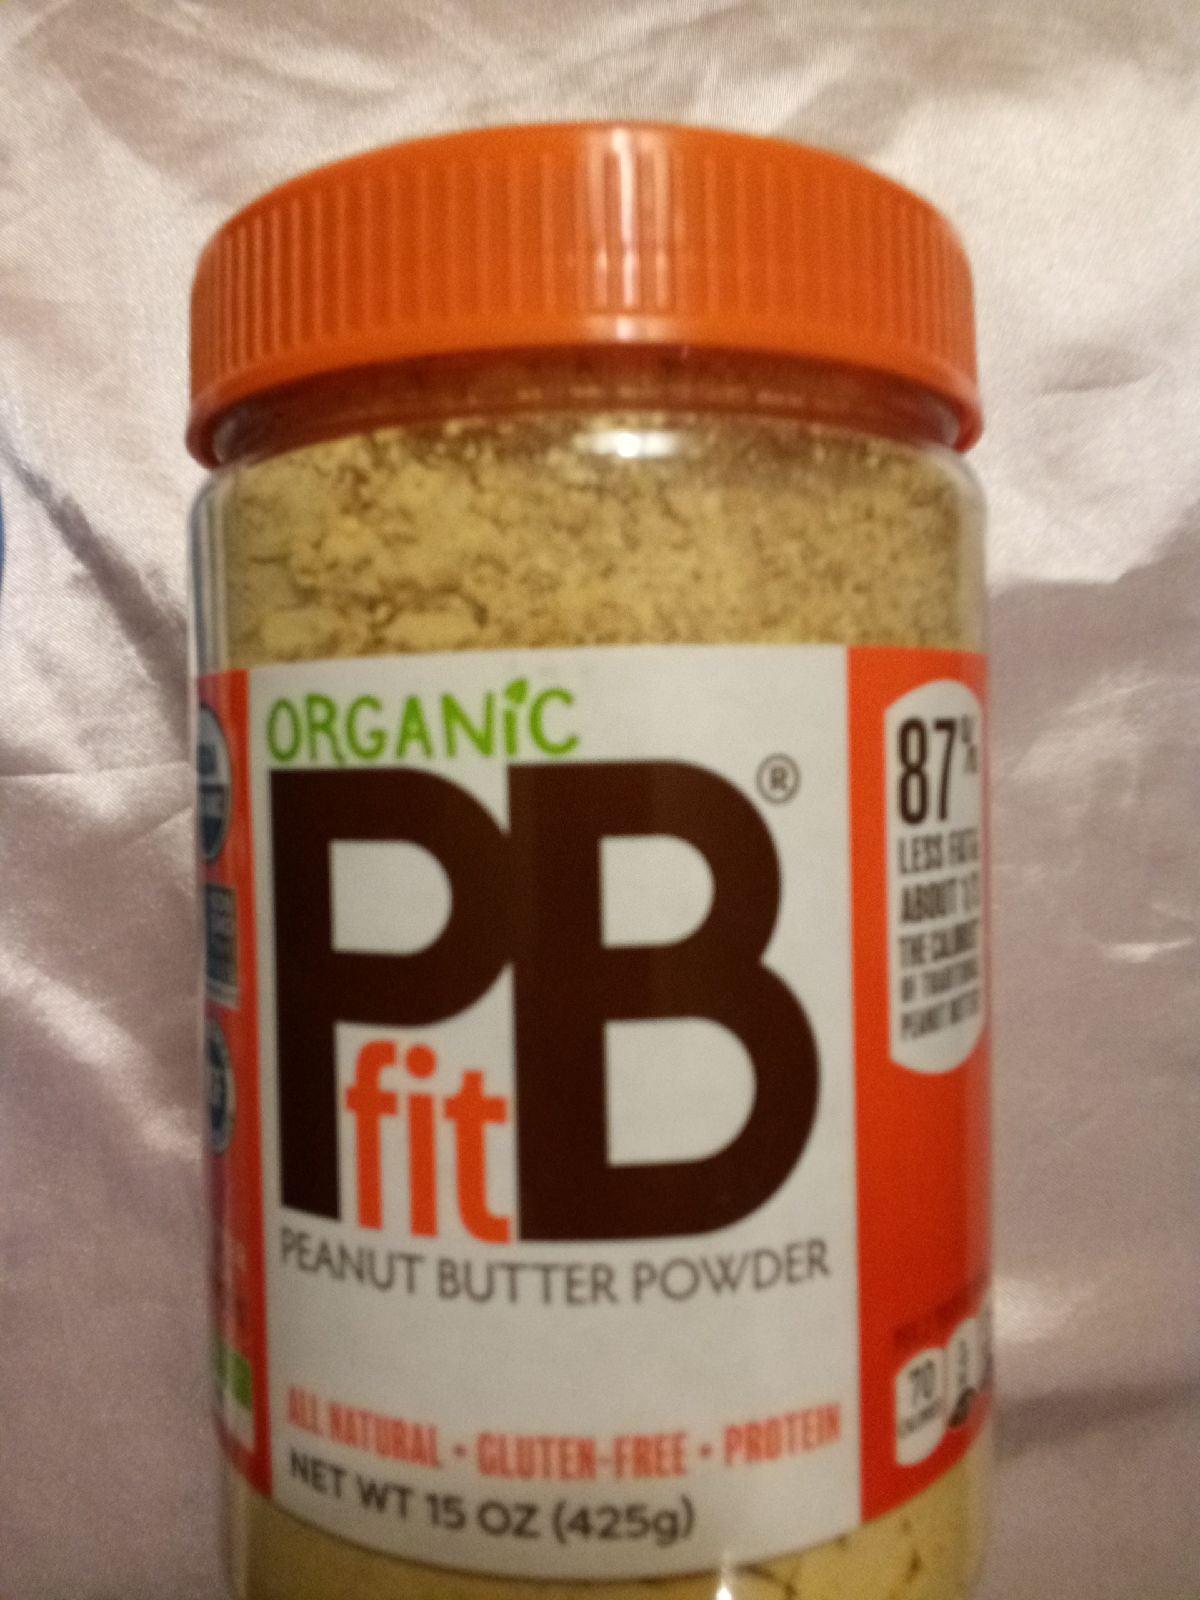 Pbfit peanut butter power